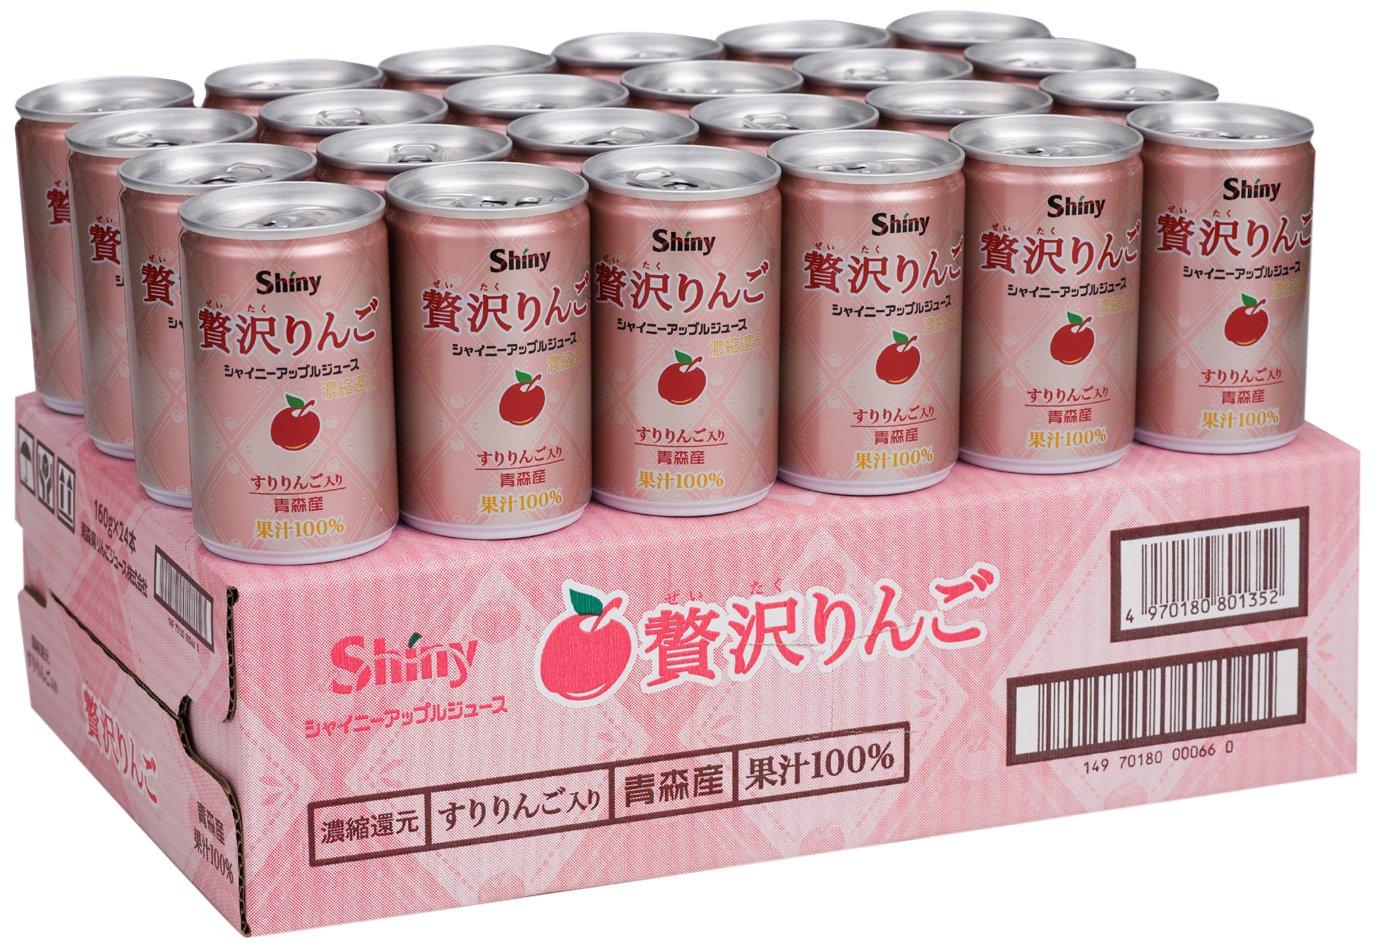 Shiny luxury apple 160gX24 cans